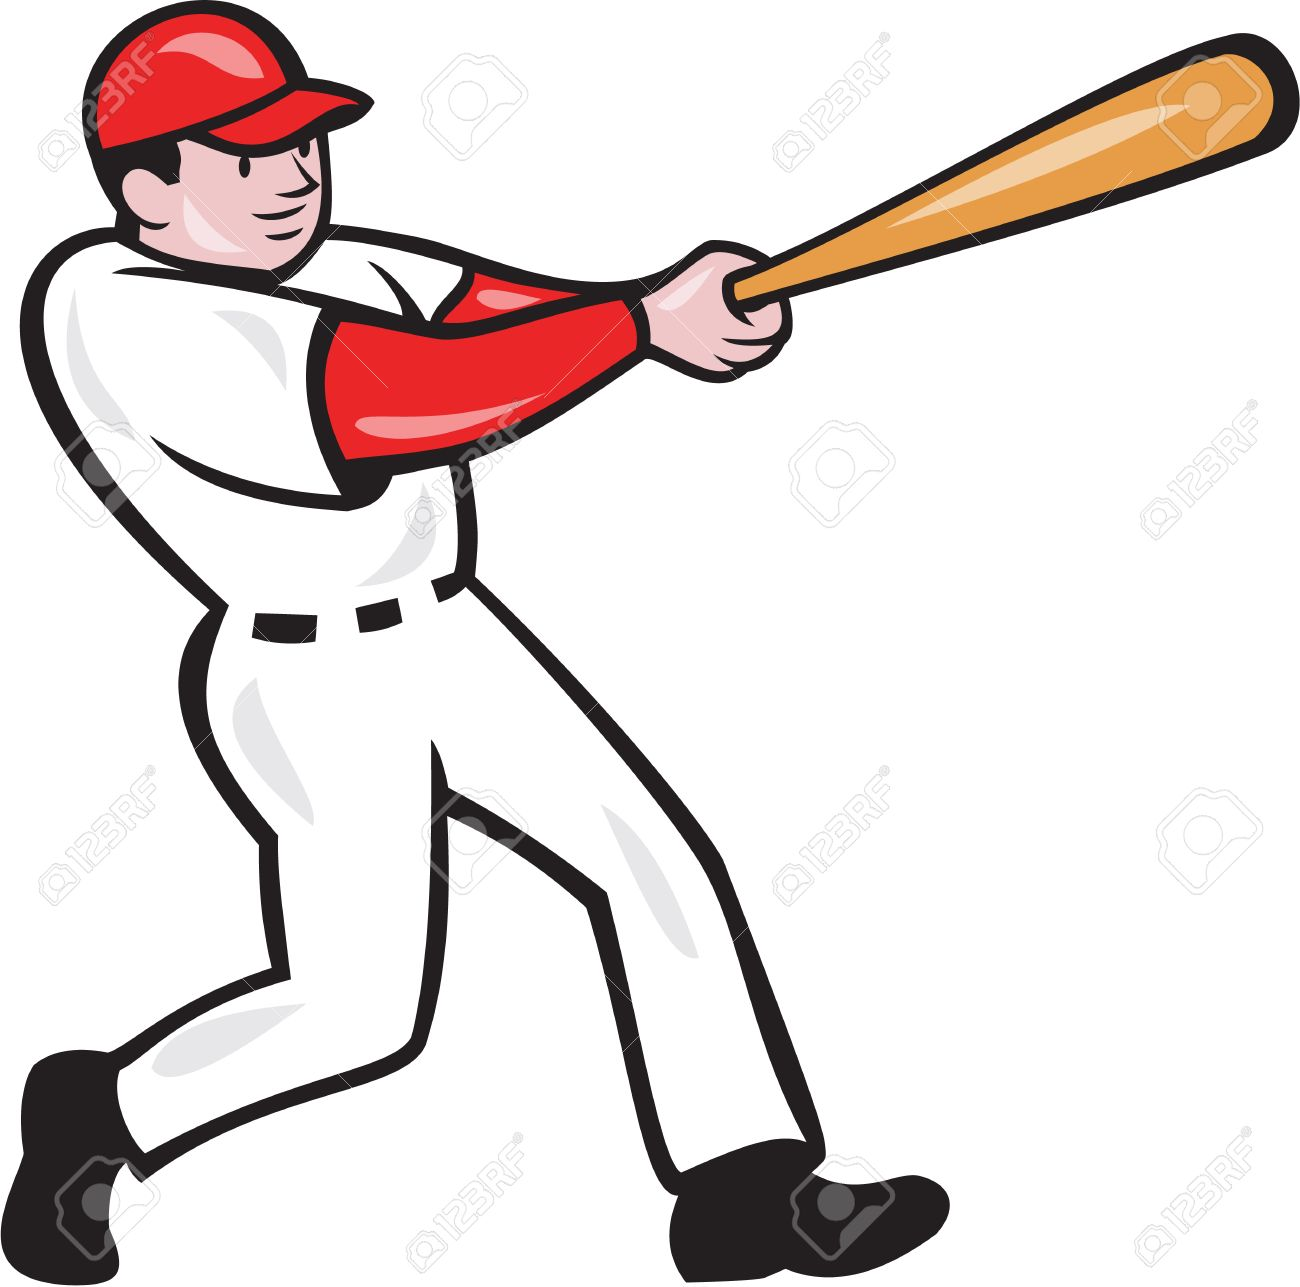 illustration of an american baseball player batter hitter batting rh 123rf com Baseball Clip Art Baseball Pitcher Clip Art